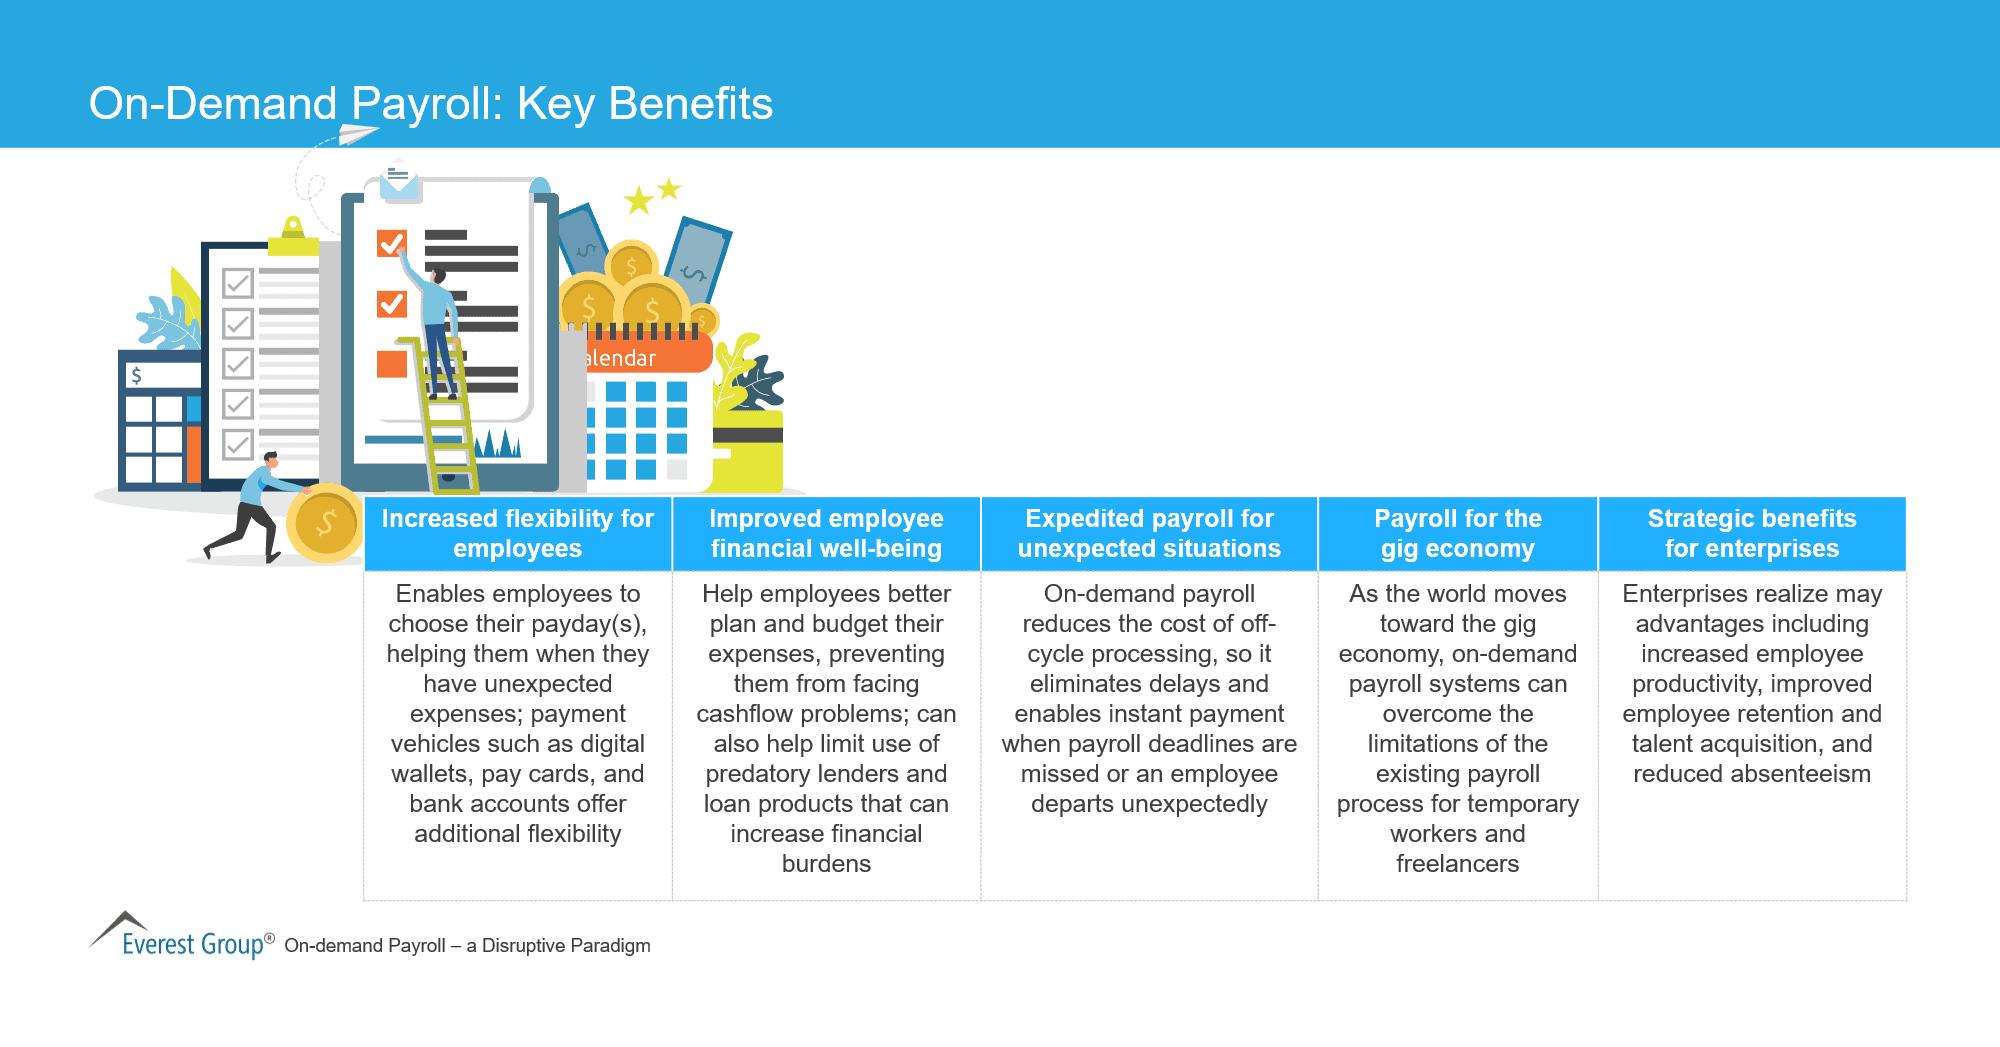 On-Demand Payroll - Key Benefits